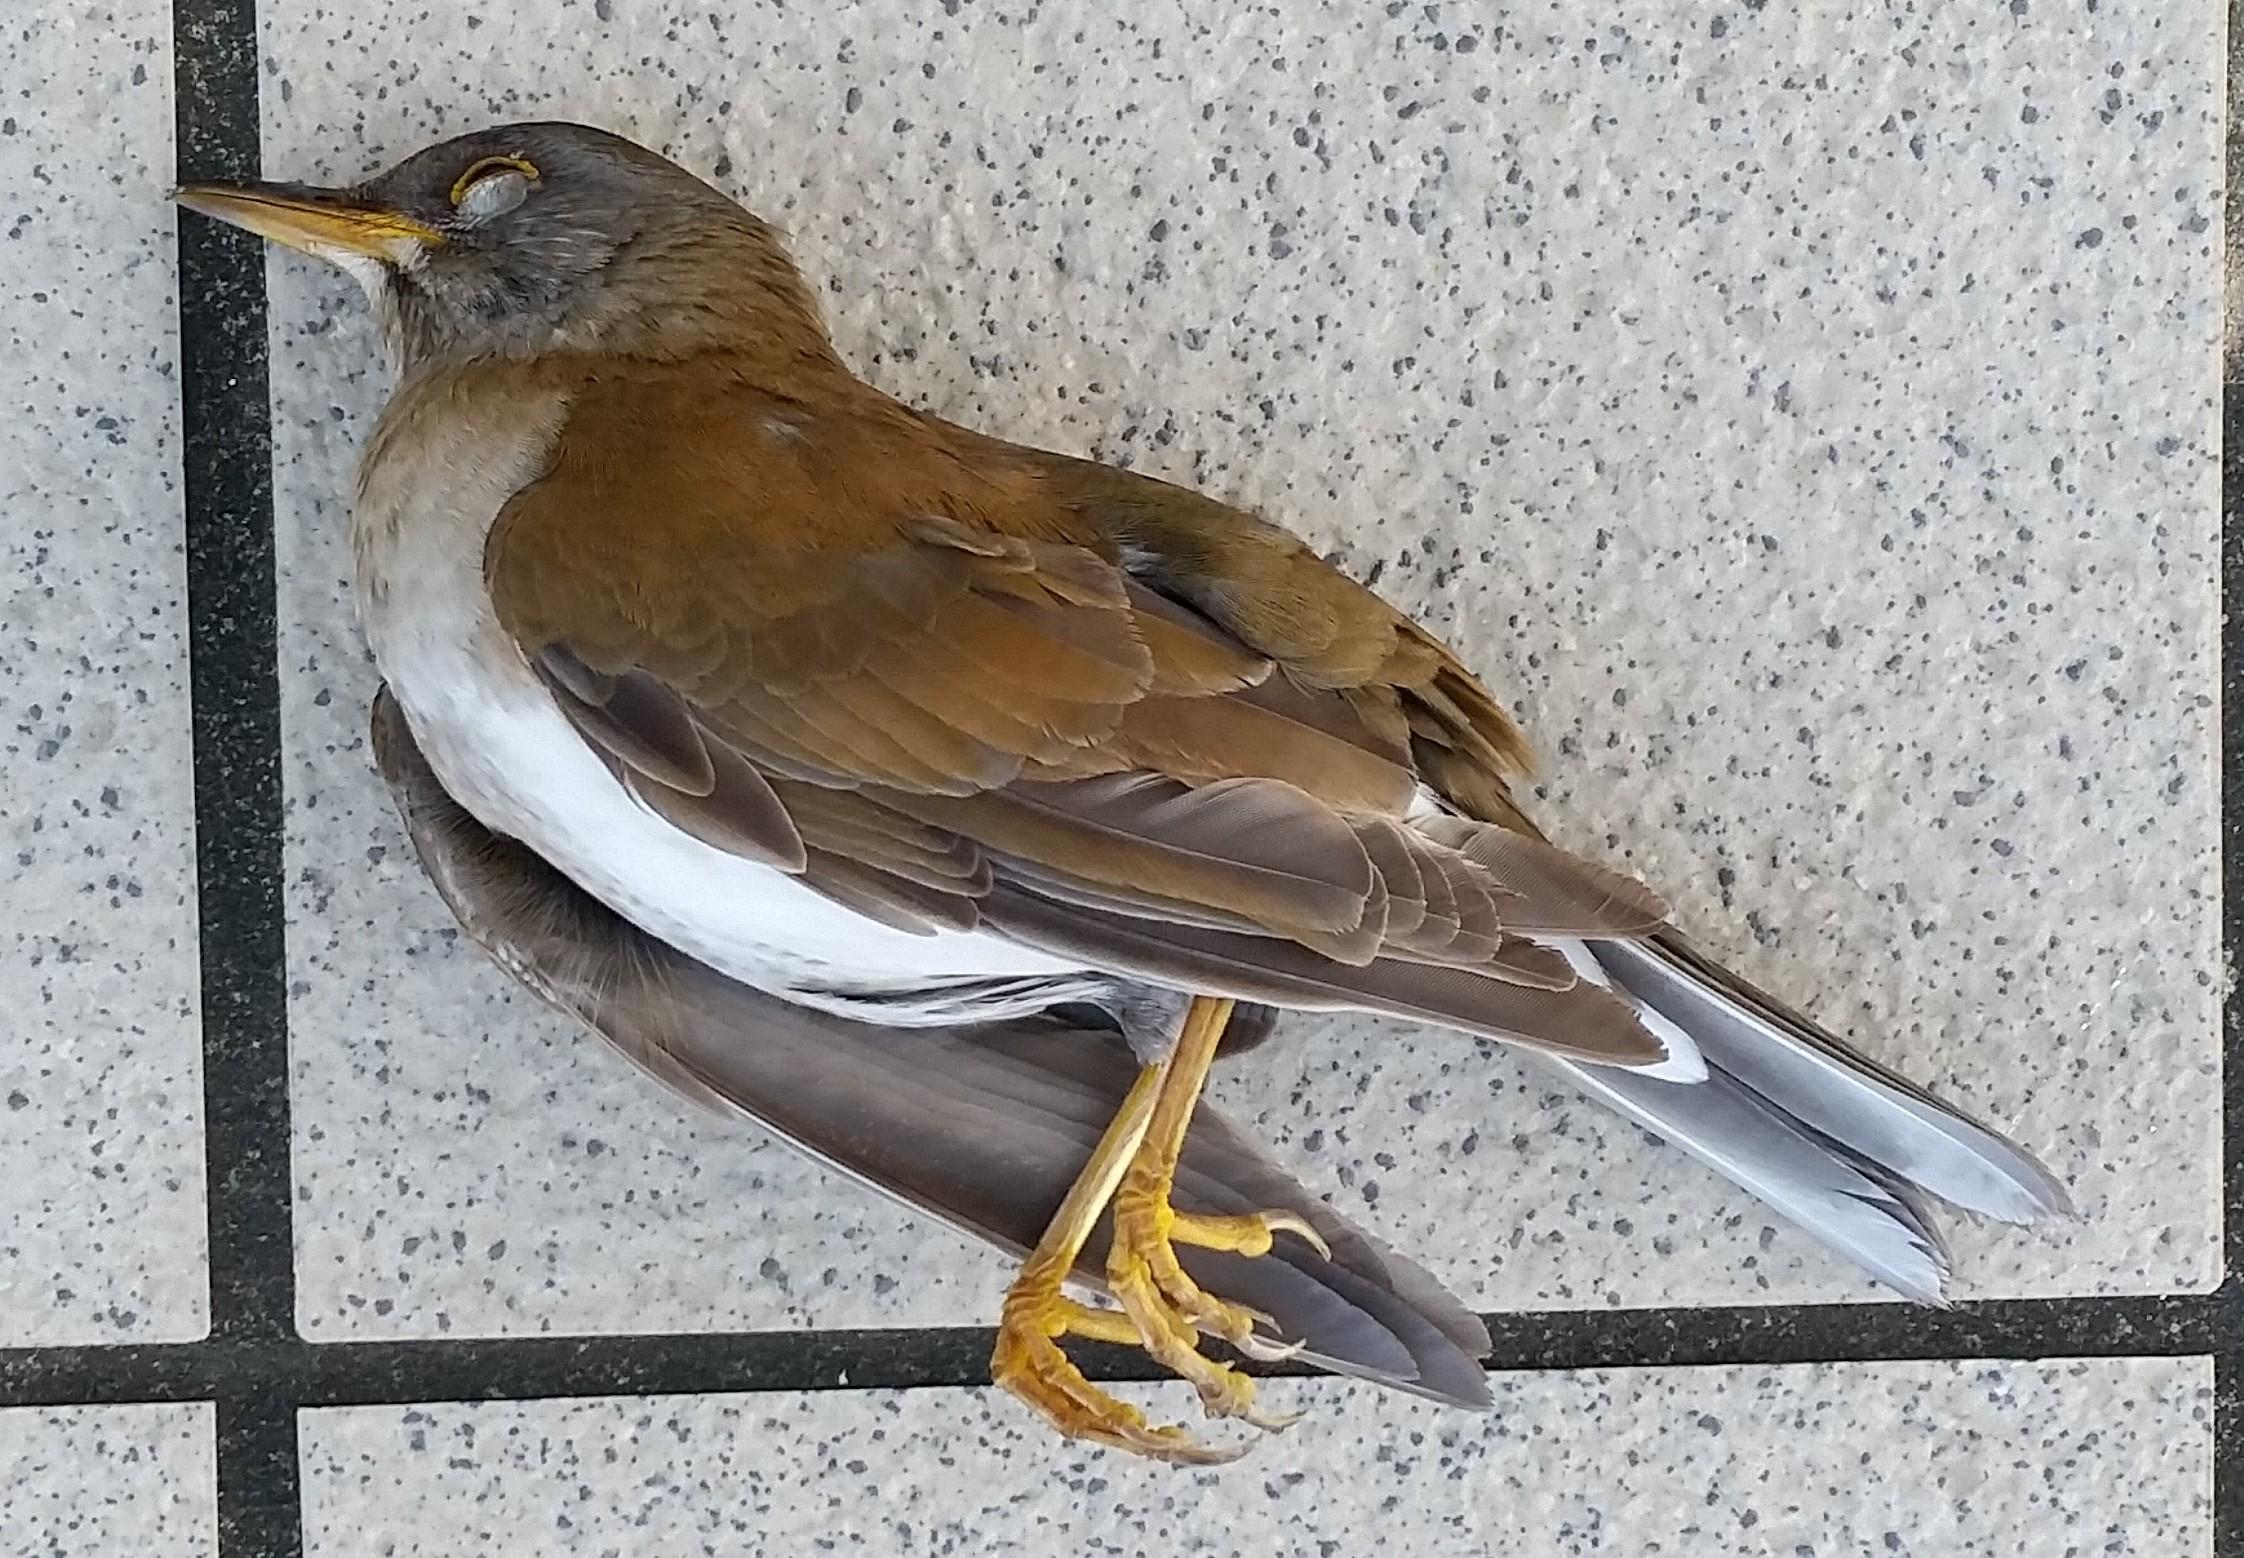 Window-killed thrush, Okinawa, Japan, 8 March 2016.